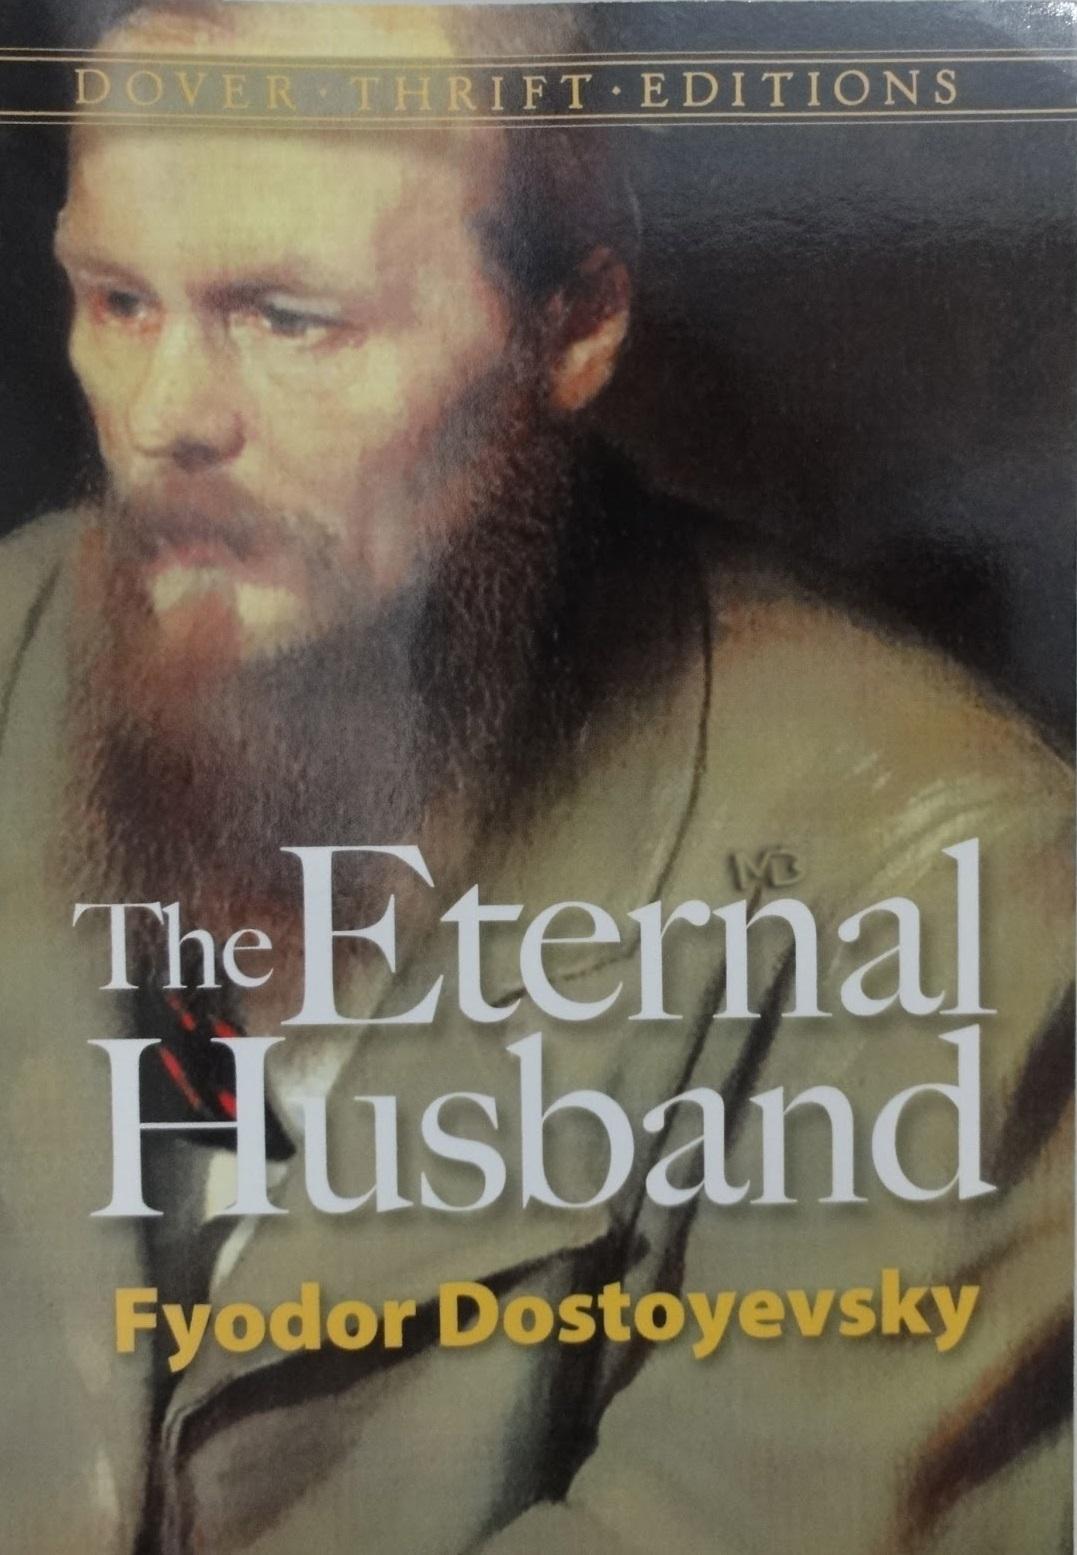 The+Eternal+Husband1 دانلود رمان همیشه شوهر